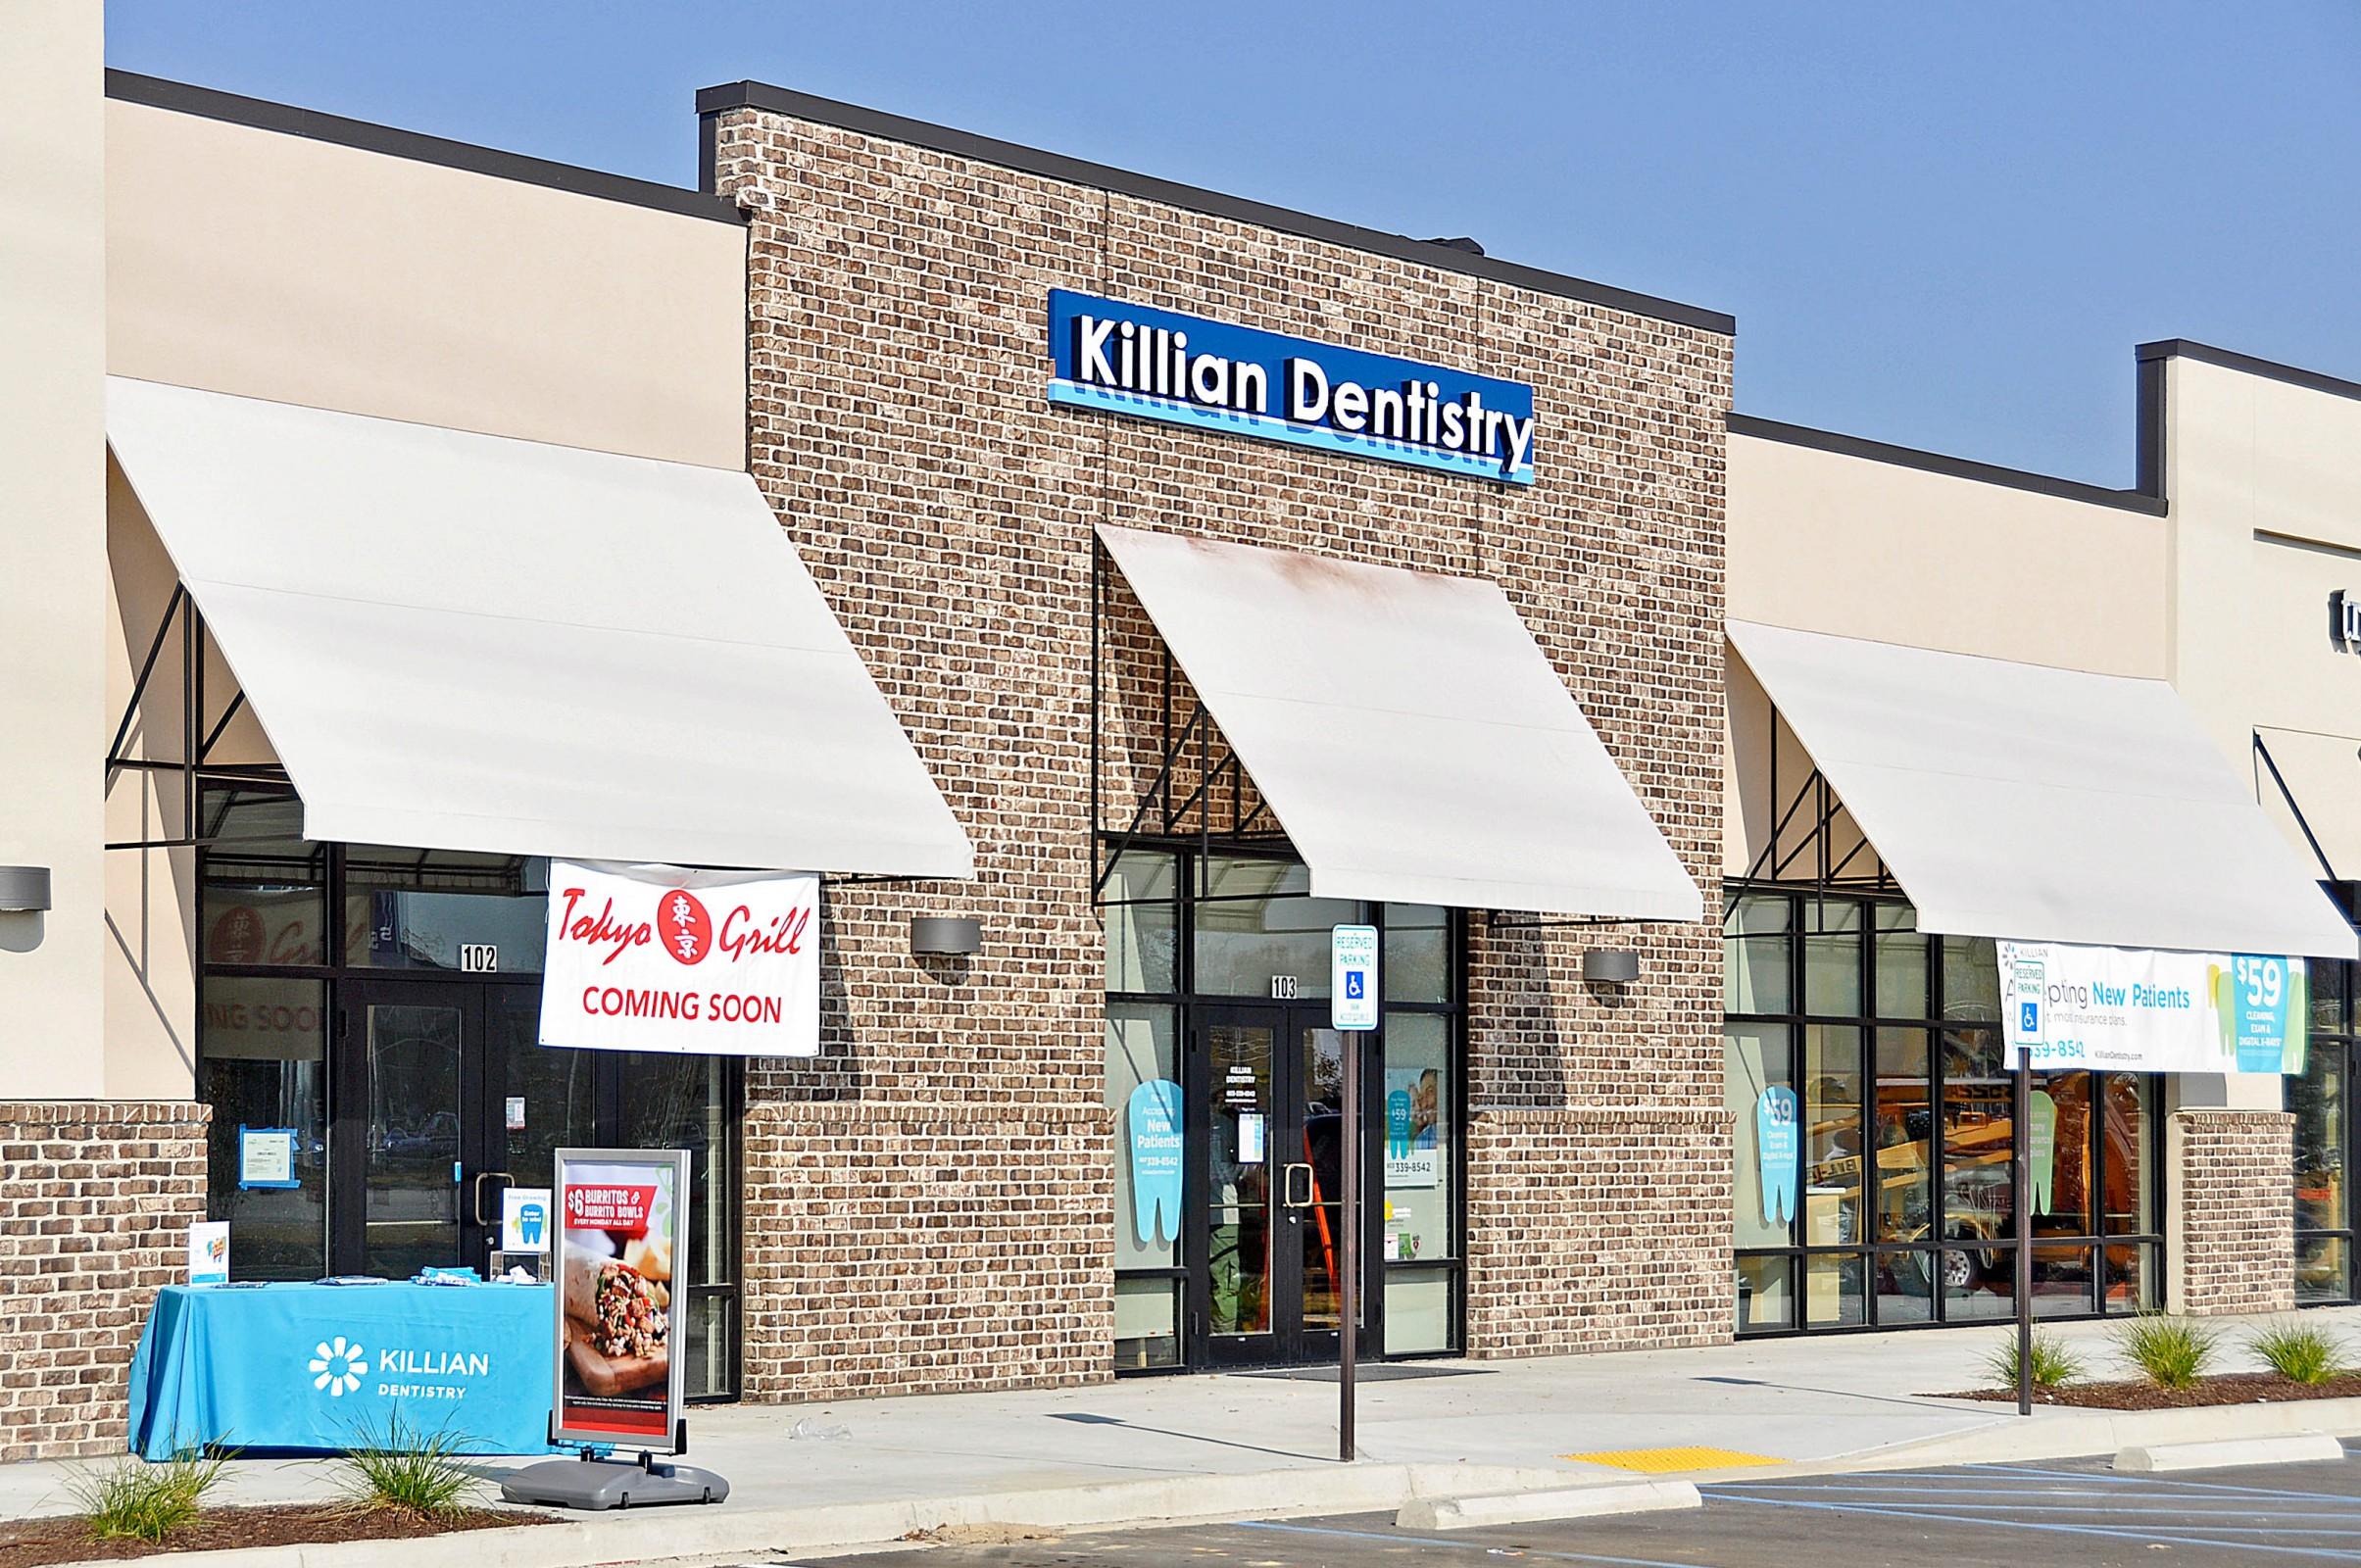 Killian Dentistry image 2